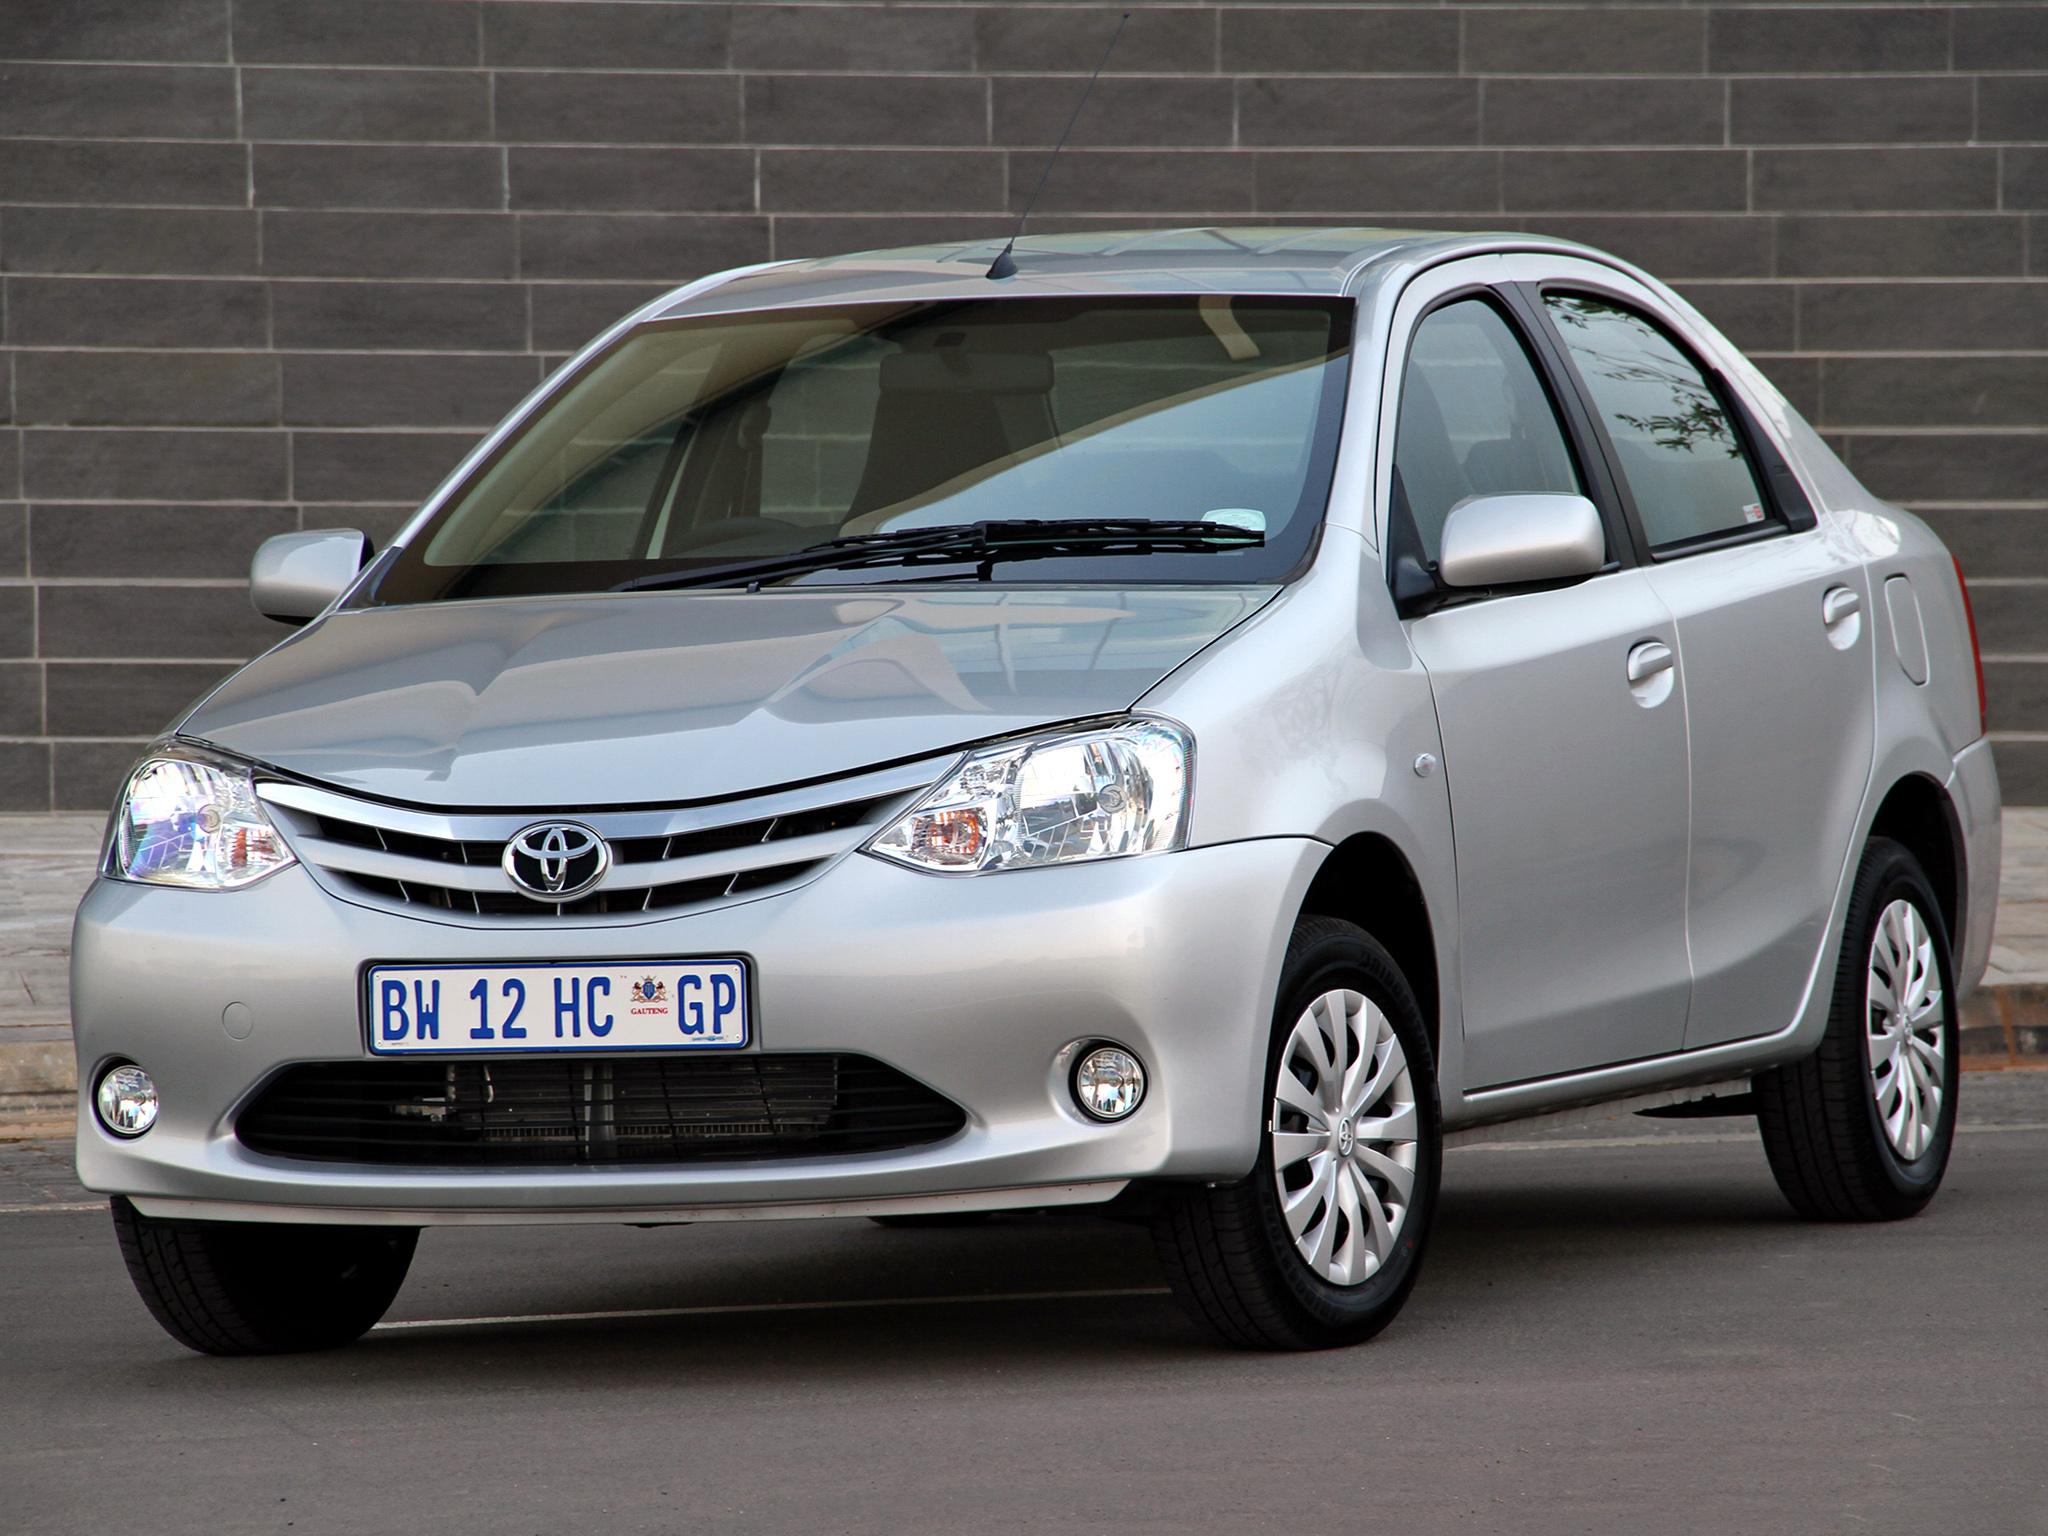 Toyota Etios Photos Photogallery With 7 Pics Carsbase Com